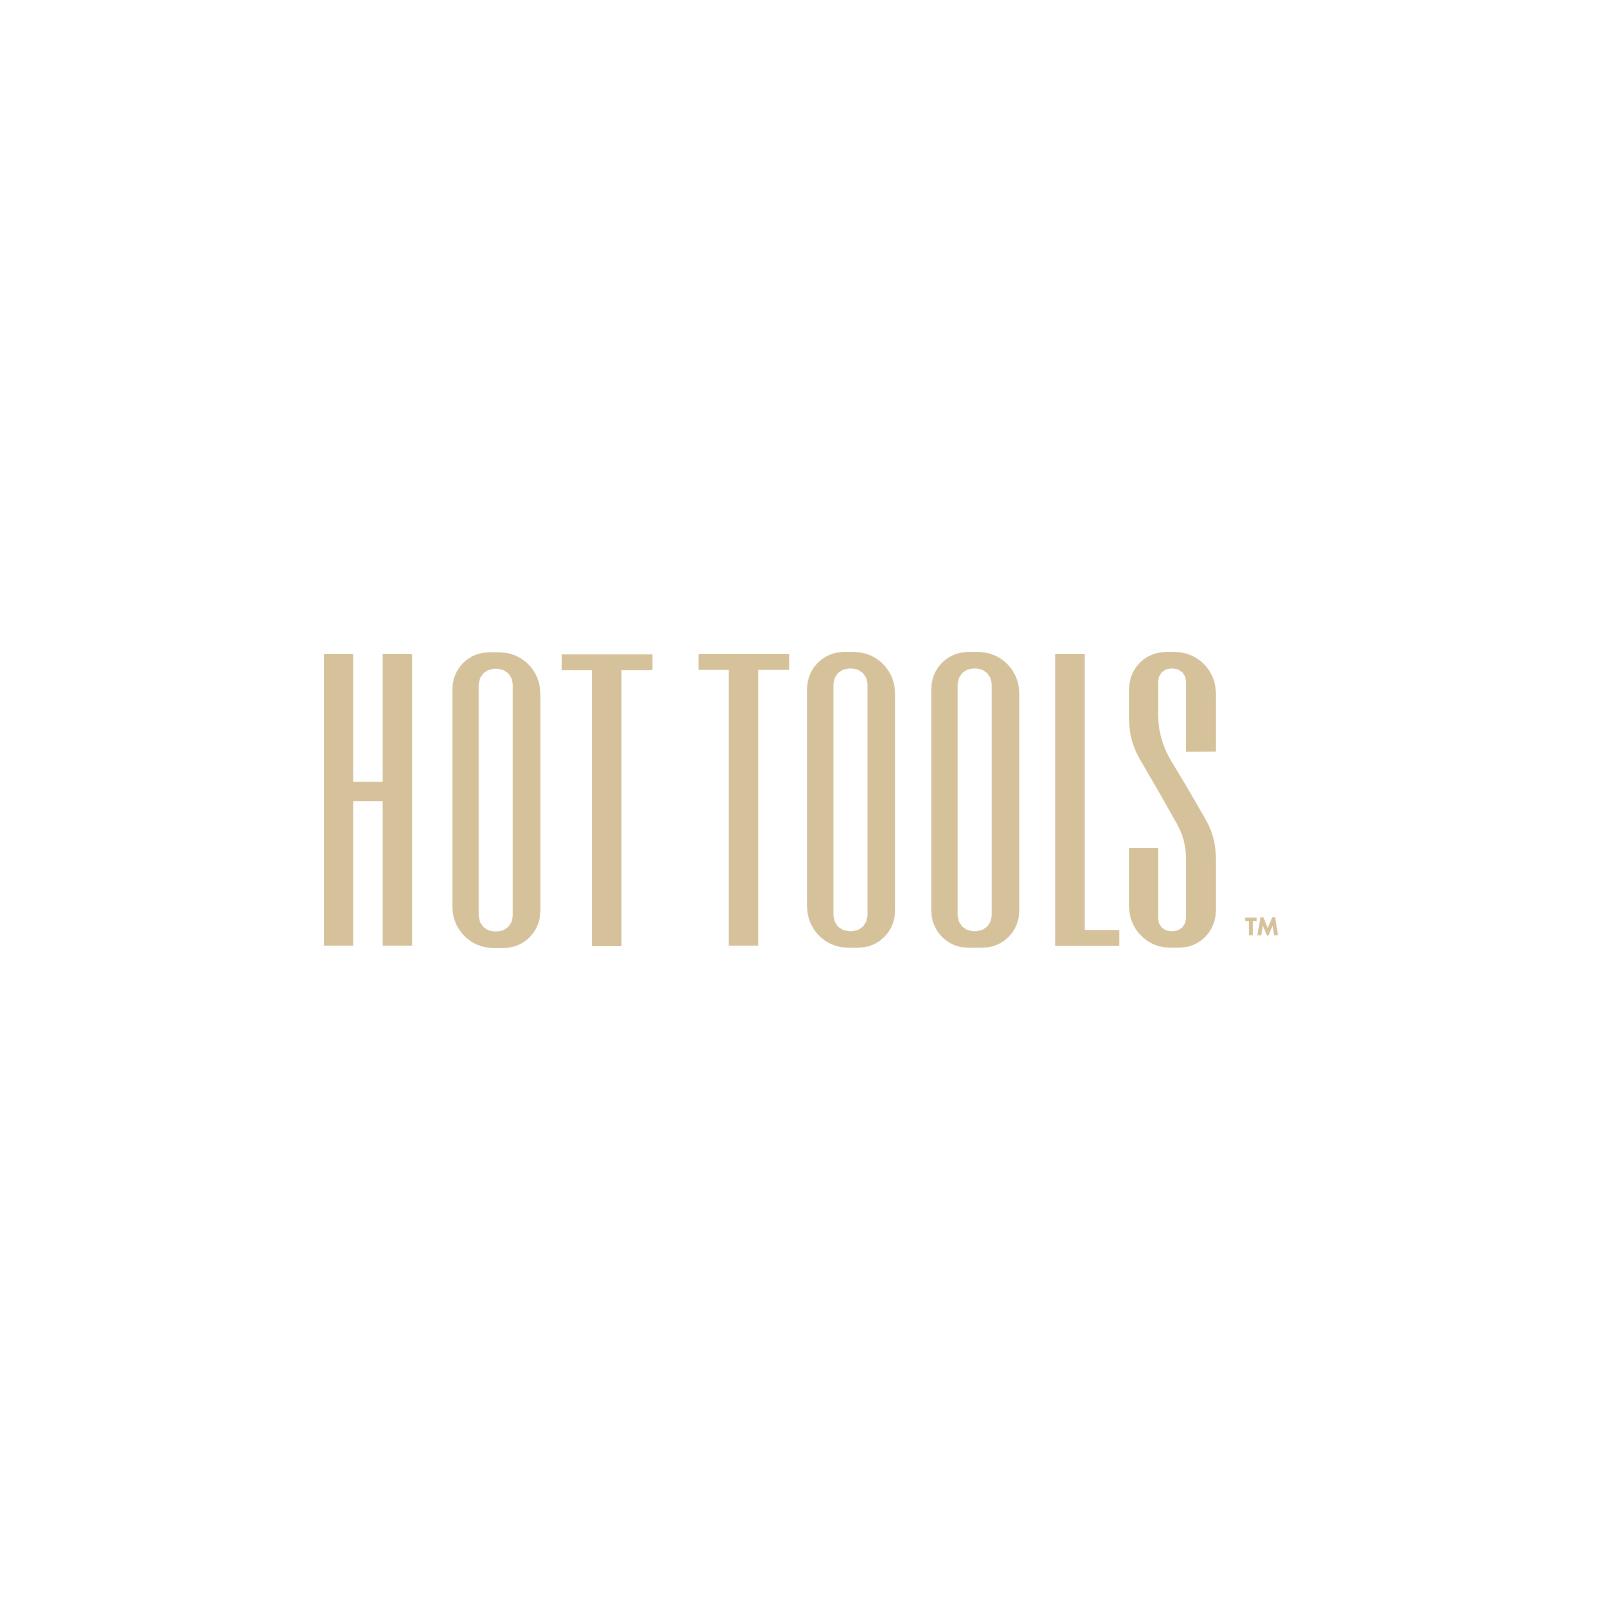 HOT TOOLS Signature Series Ionic Ceramic Salon Hair Dryer product image